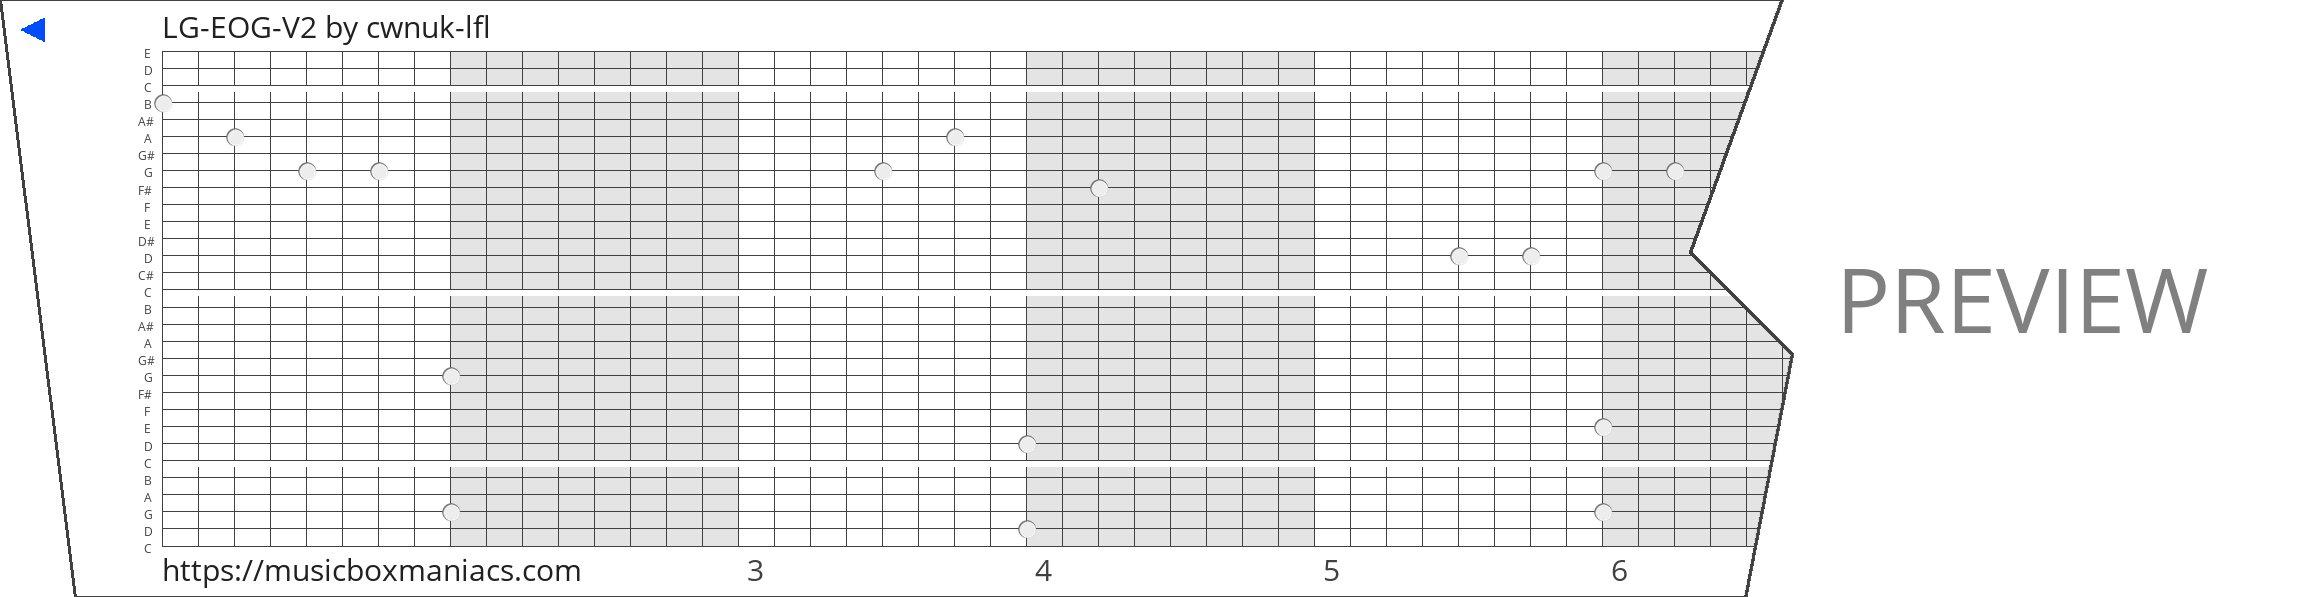 LG-EOG-V2 30 note music box paper strip